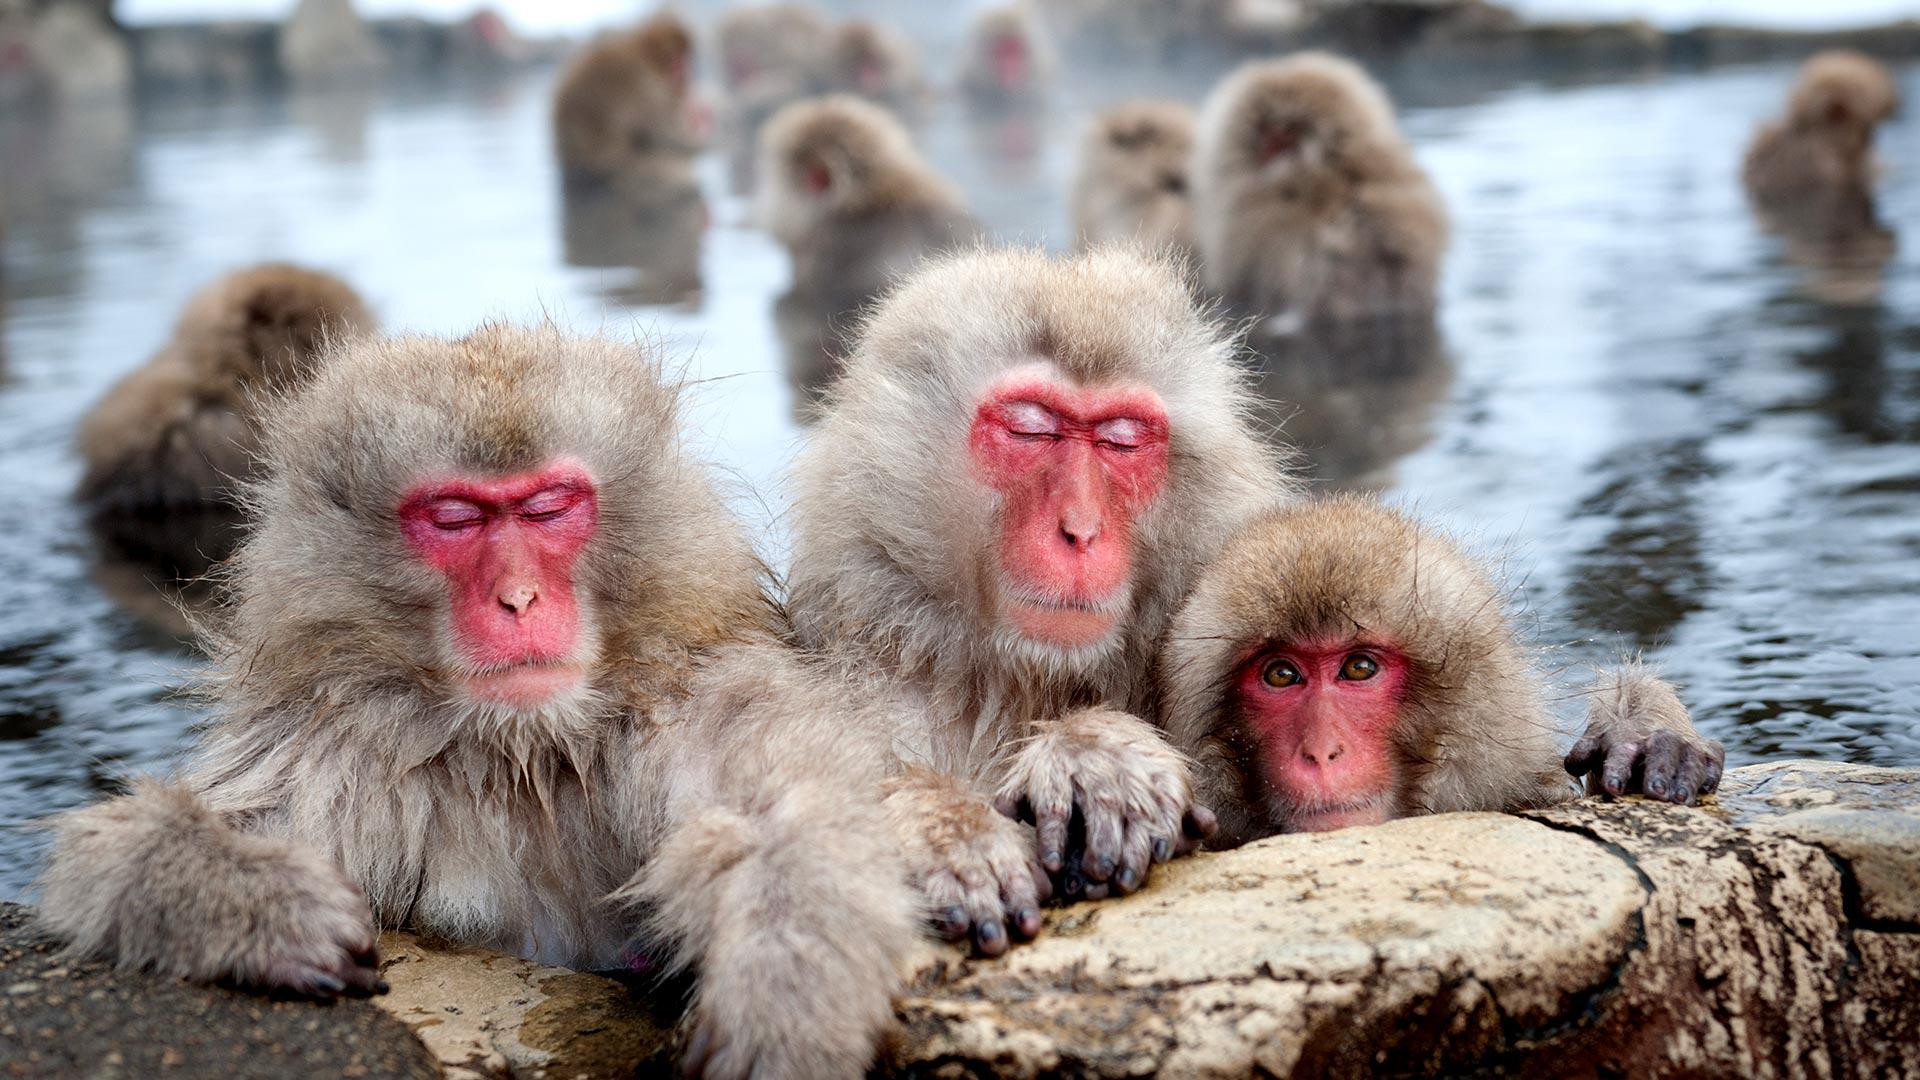 Snow monkeys (Japanese macaques), Nagano, Japan (© redswept/Shutterstock)